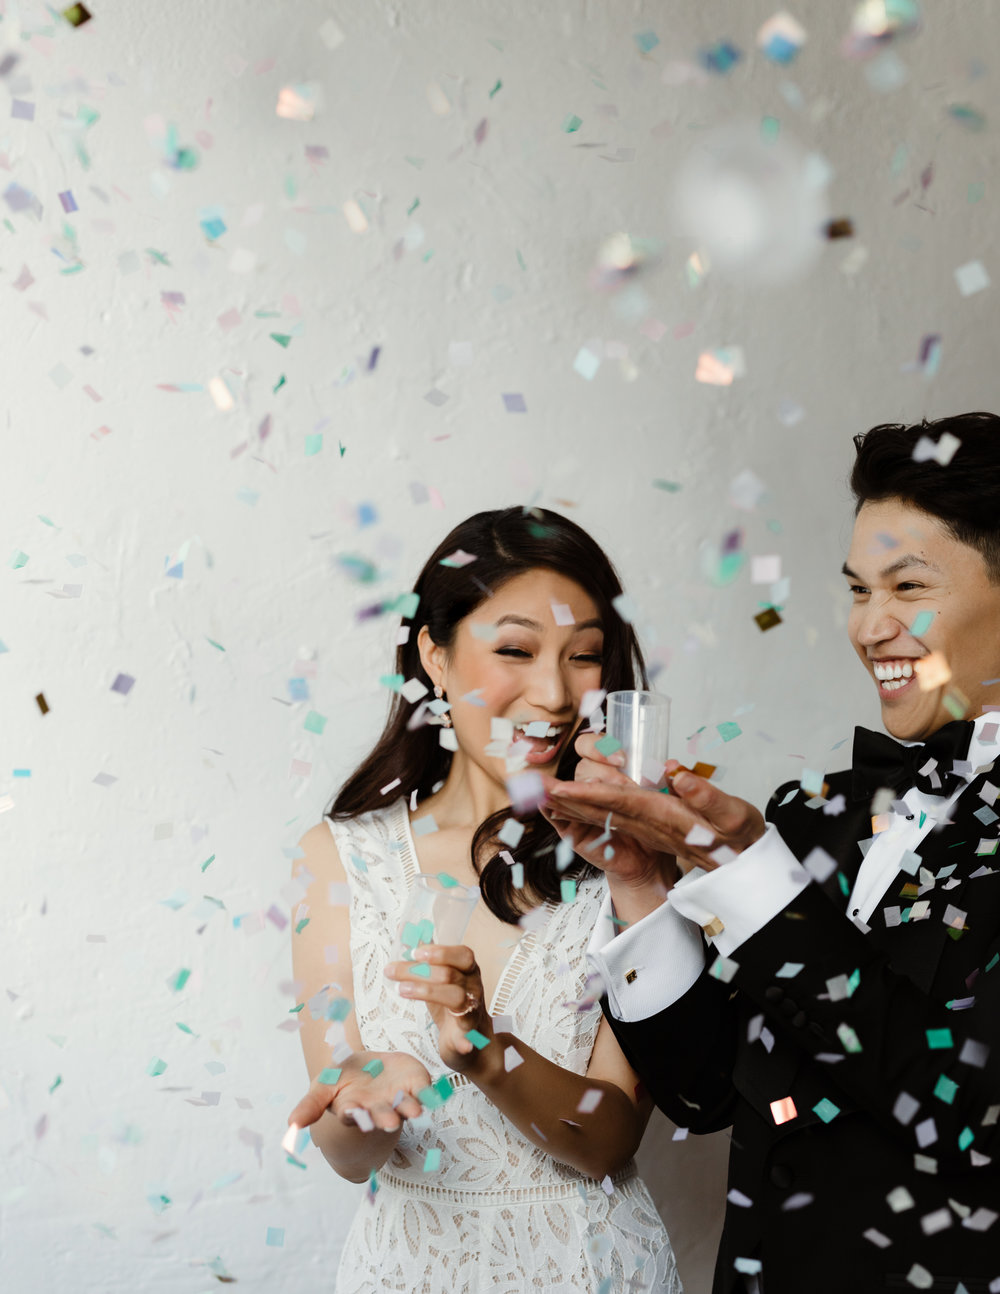 chelseafabrizio wedding photographer